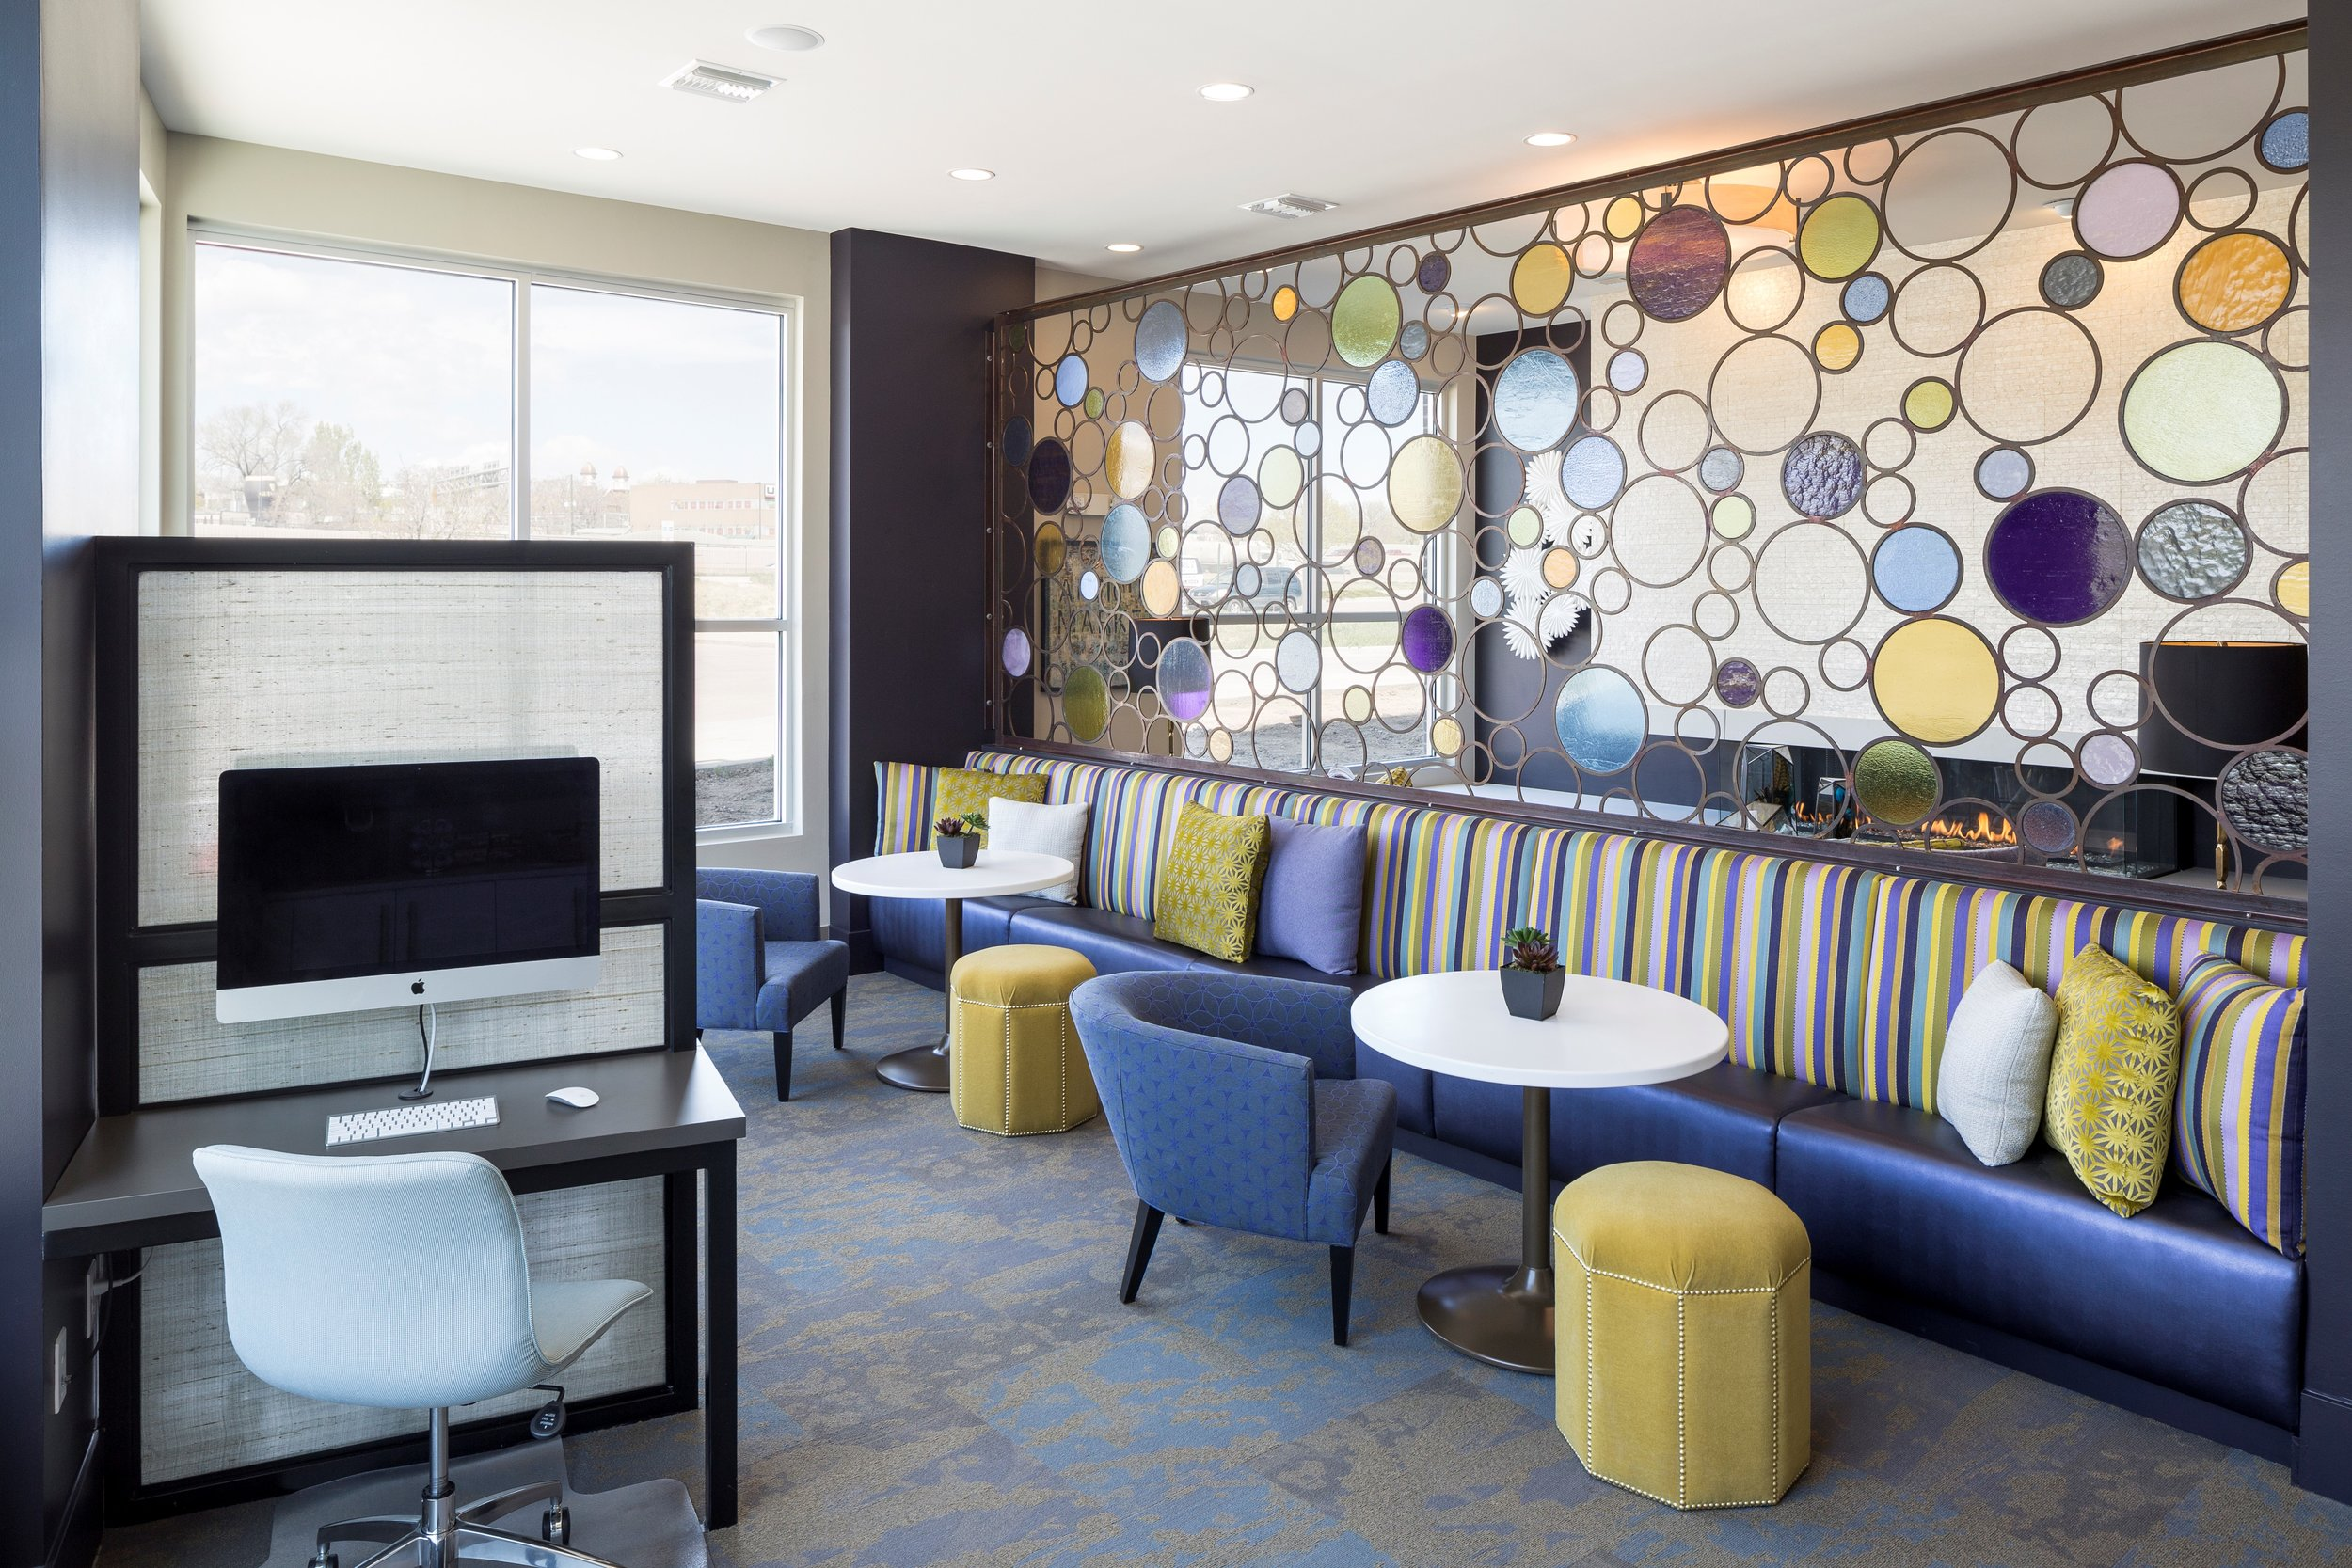 12-Coffee _ Business Lounge With Fireplace.jpg